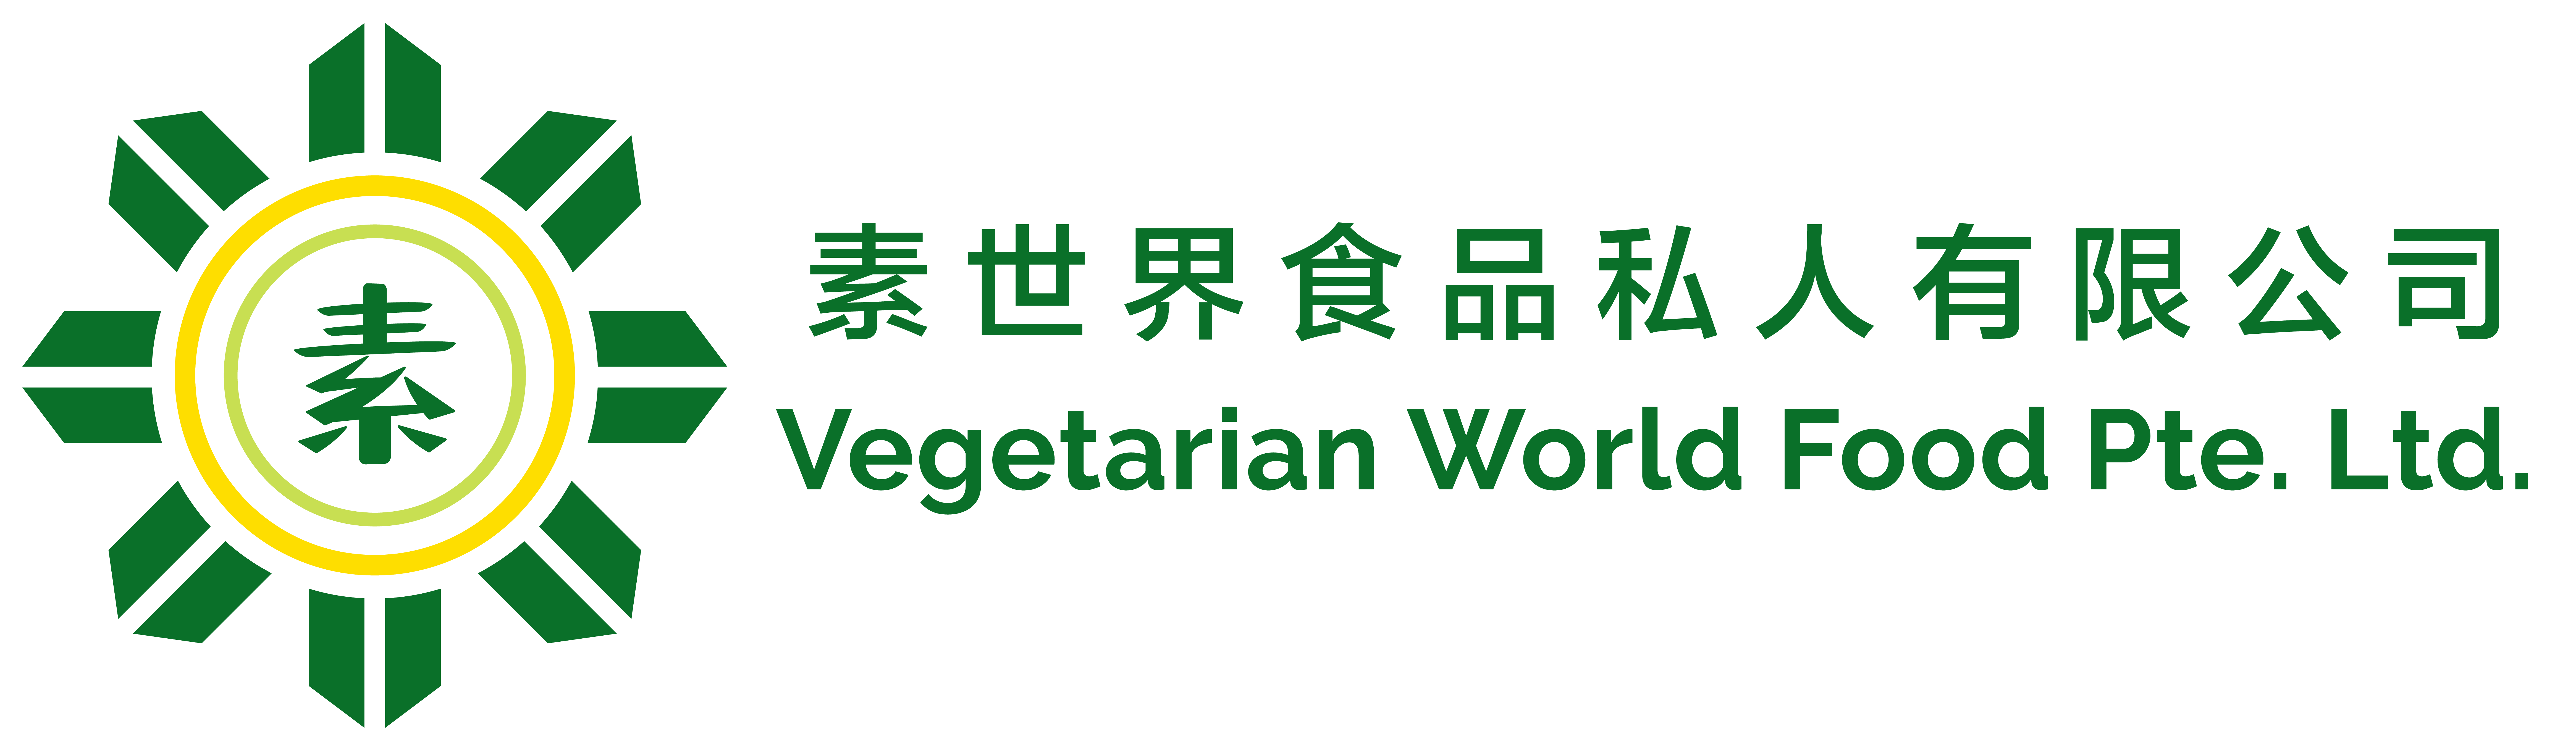 VegetarianWorldFoods